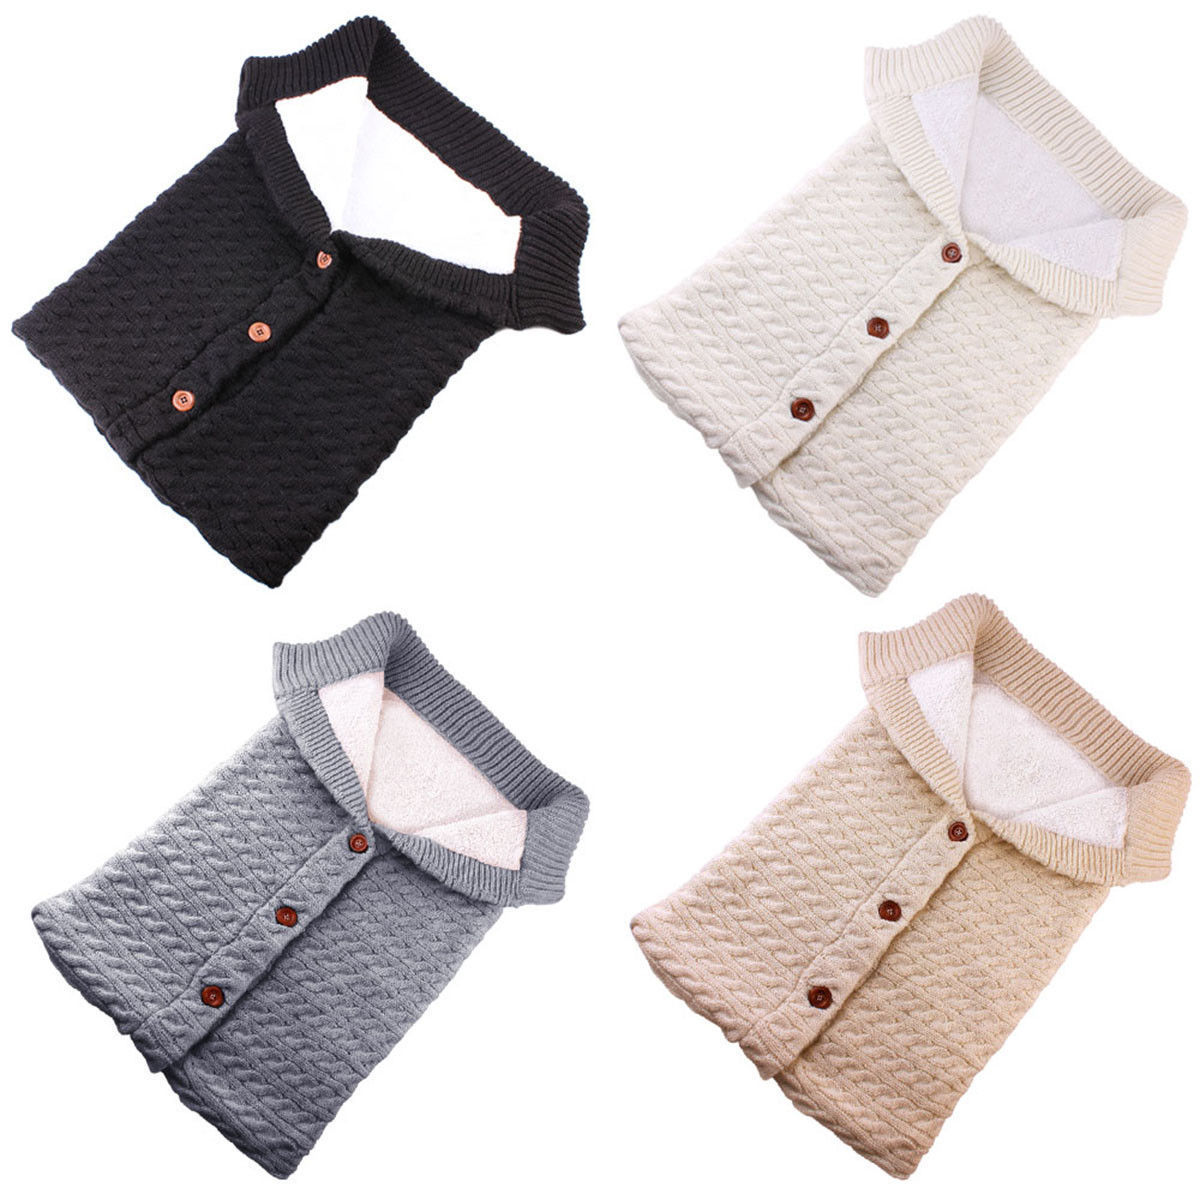 Newborn Baby Winter Warm Sleeping Bags Infant Button Knit Swaddle Wrap Swaddling Stroller Wrap Toddler Blanket Sleeping Bags 2